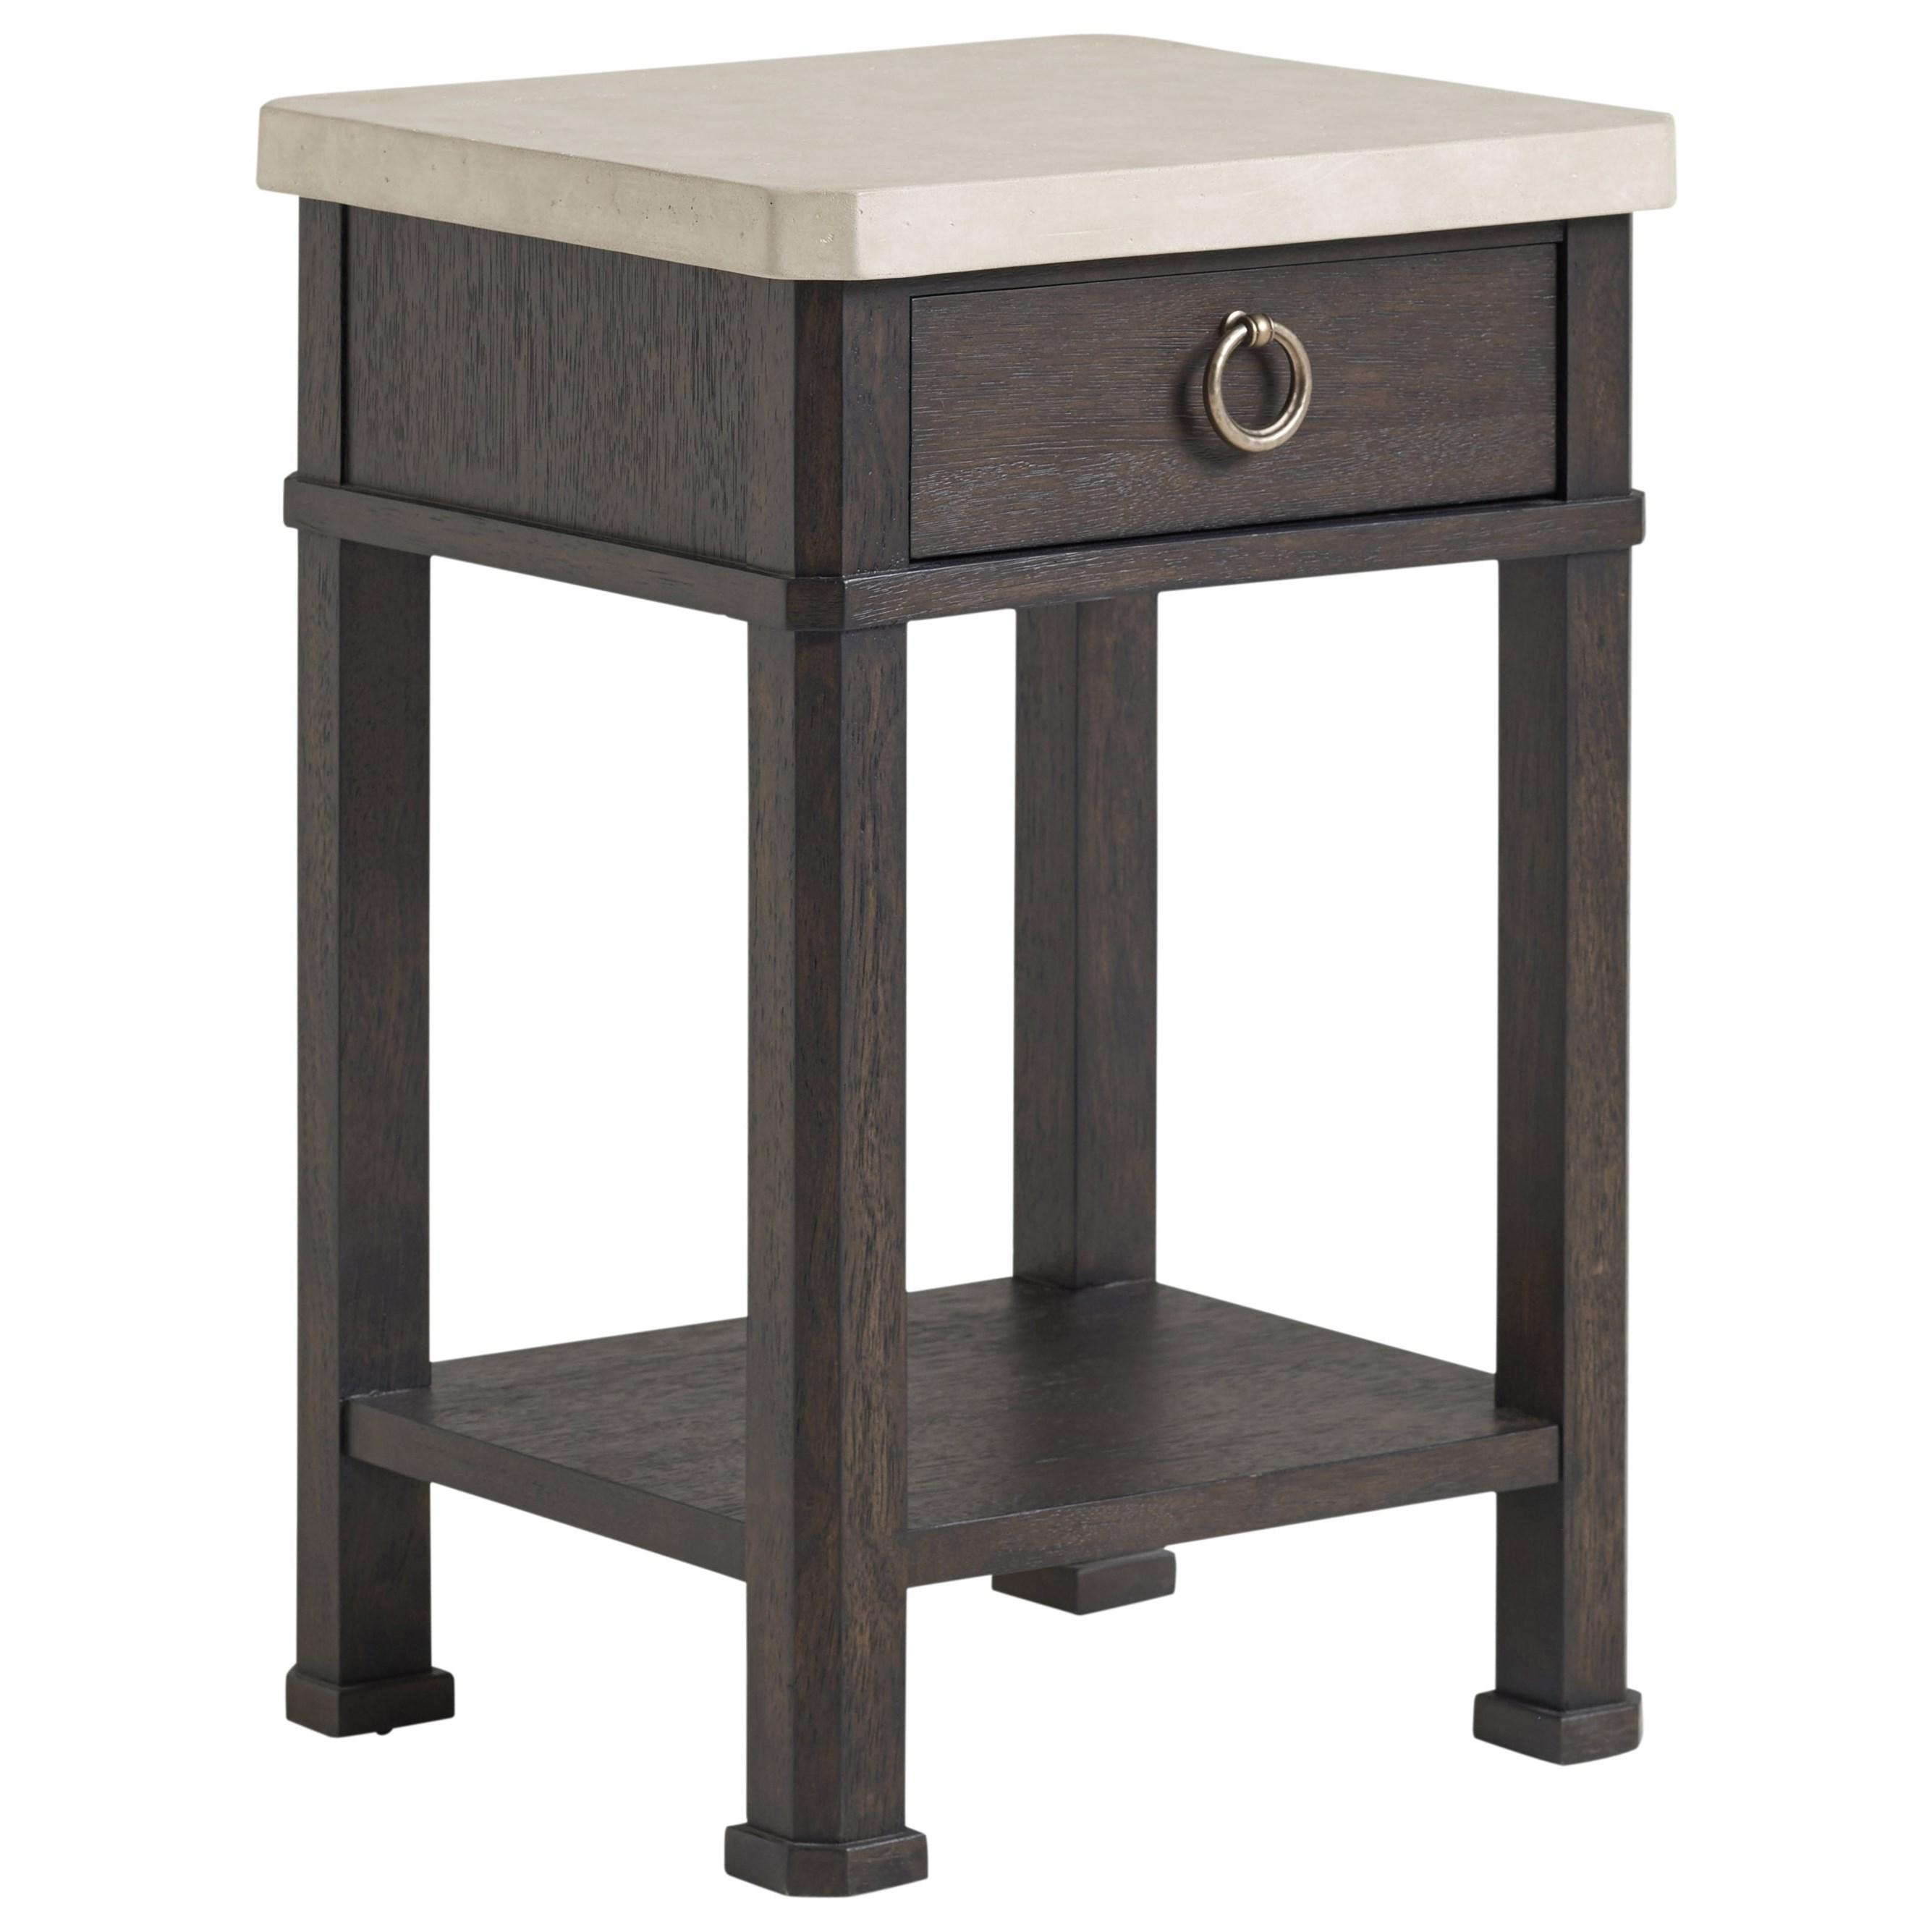 Malibu Escondido Night Table by Barclay Butera at Baer's Furniture